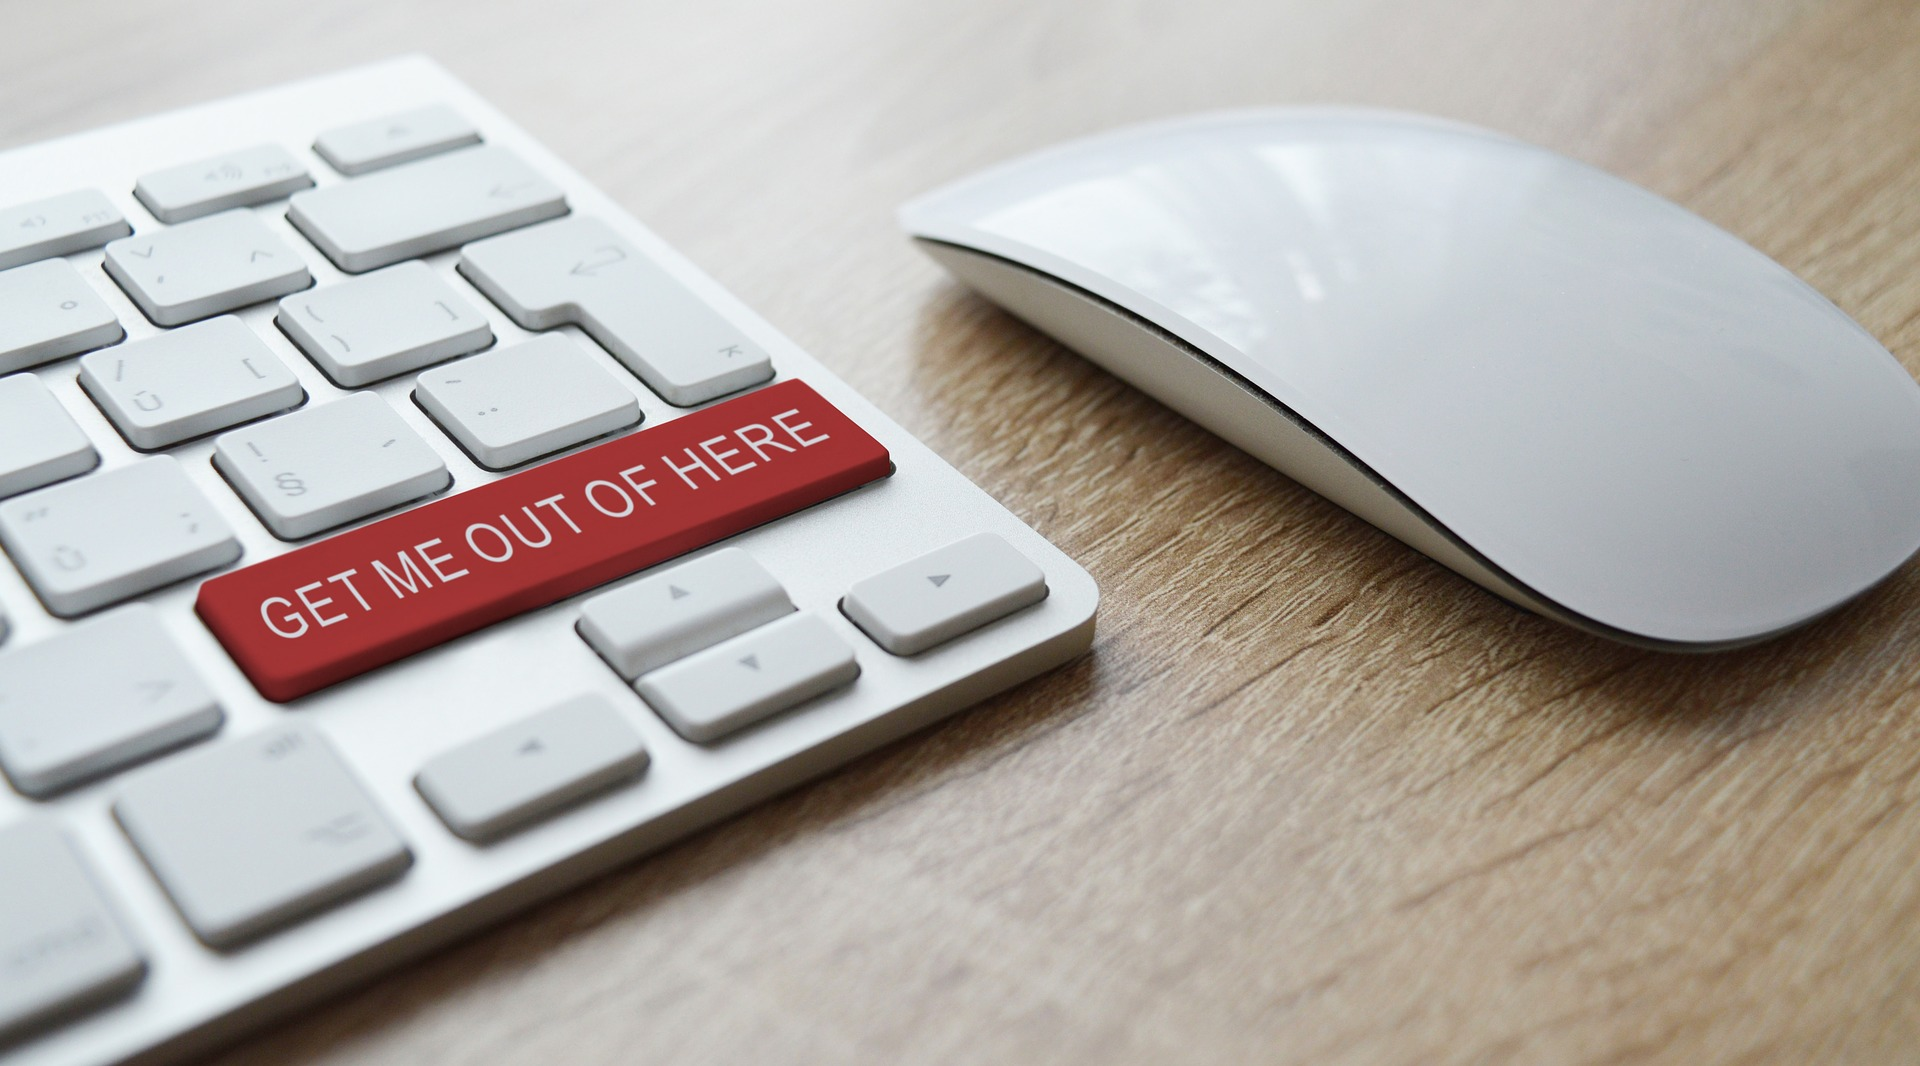 Is Pokcoins a Scam and Untrustworthy Website?